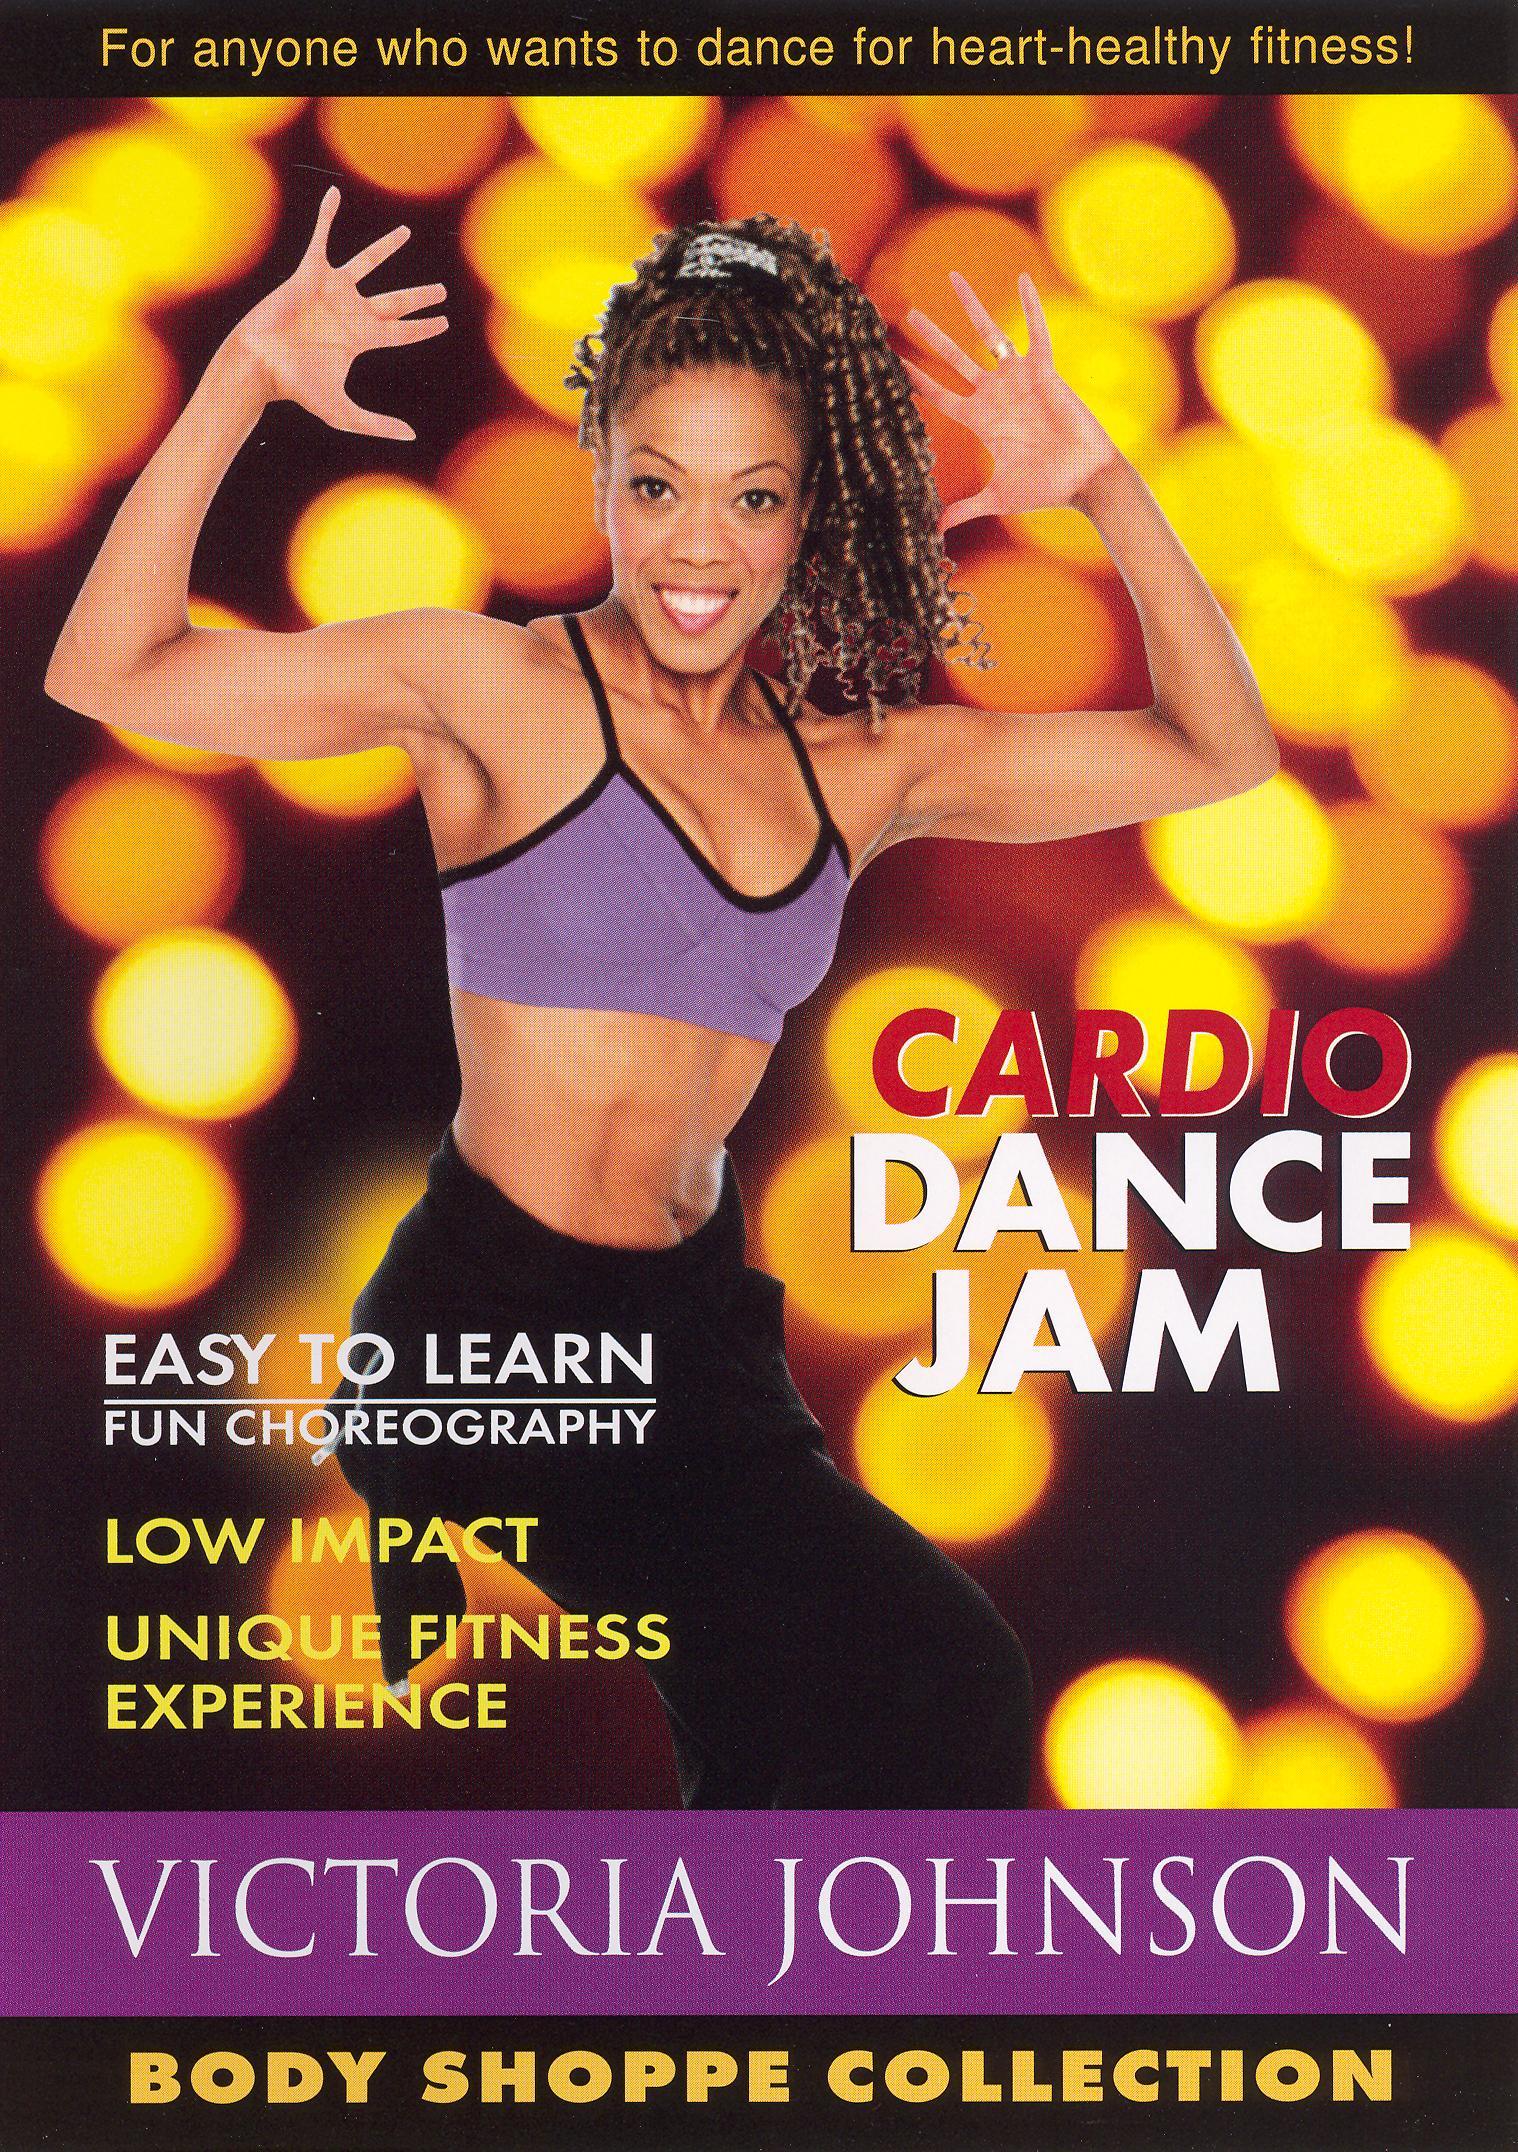 Victoria Johnson: Cardio Dance Jam